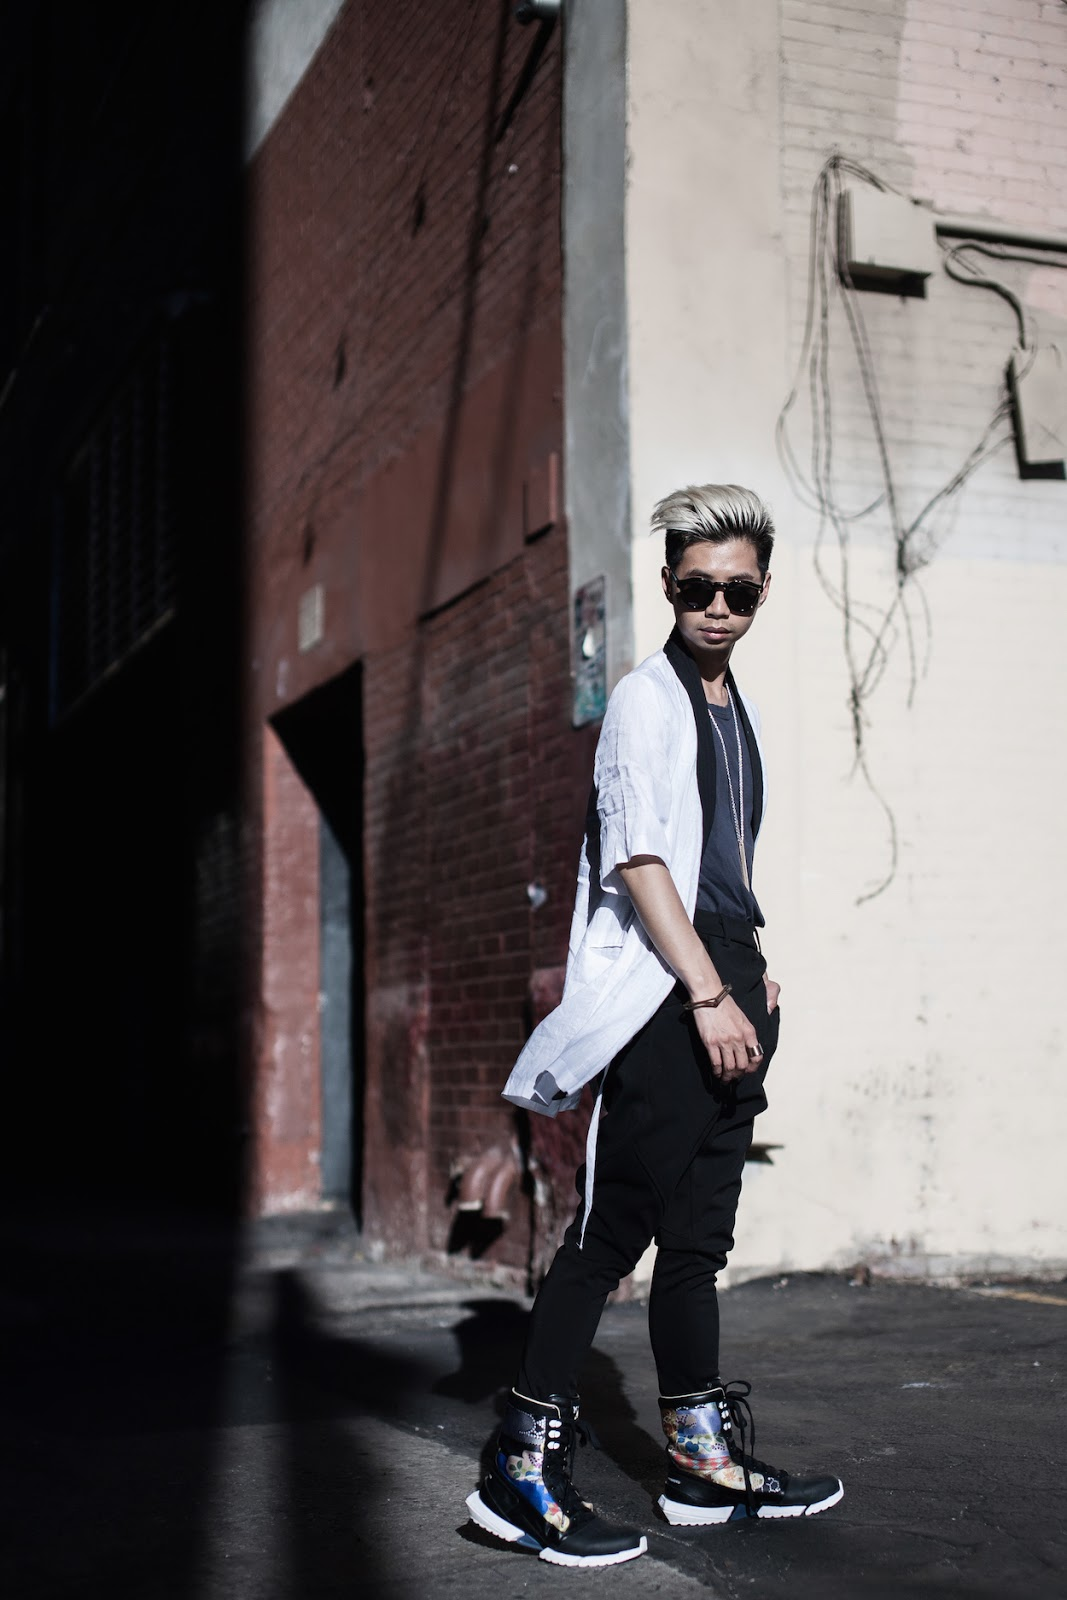 mybelonging-tommylei-menswearblogger-lura-brand-eyewear-3paradis-4.jpg